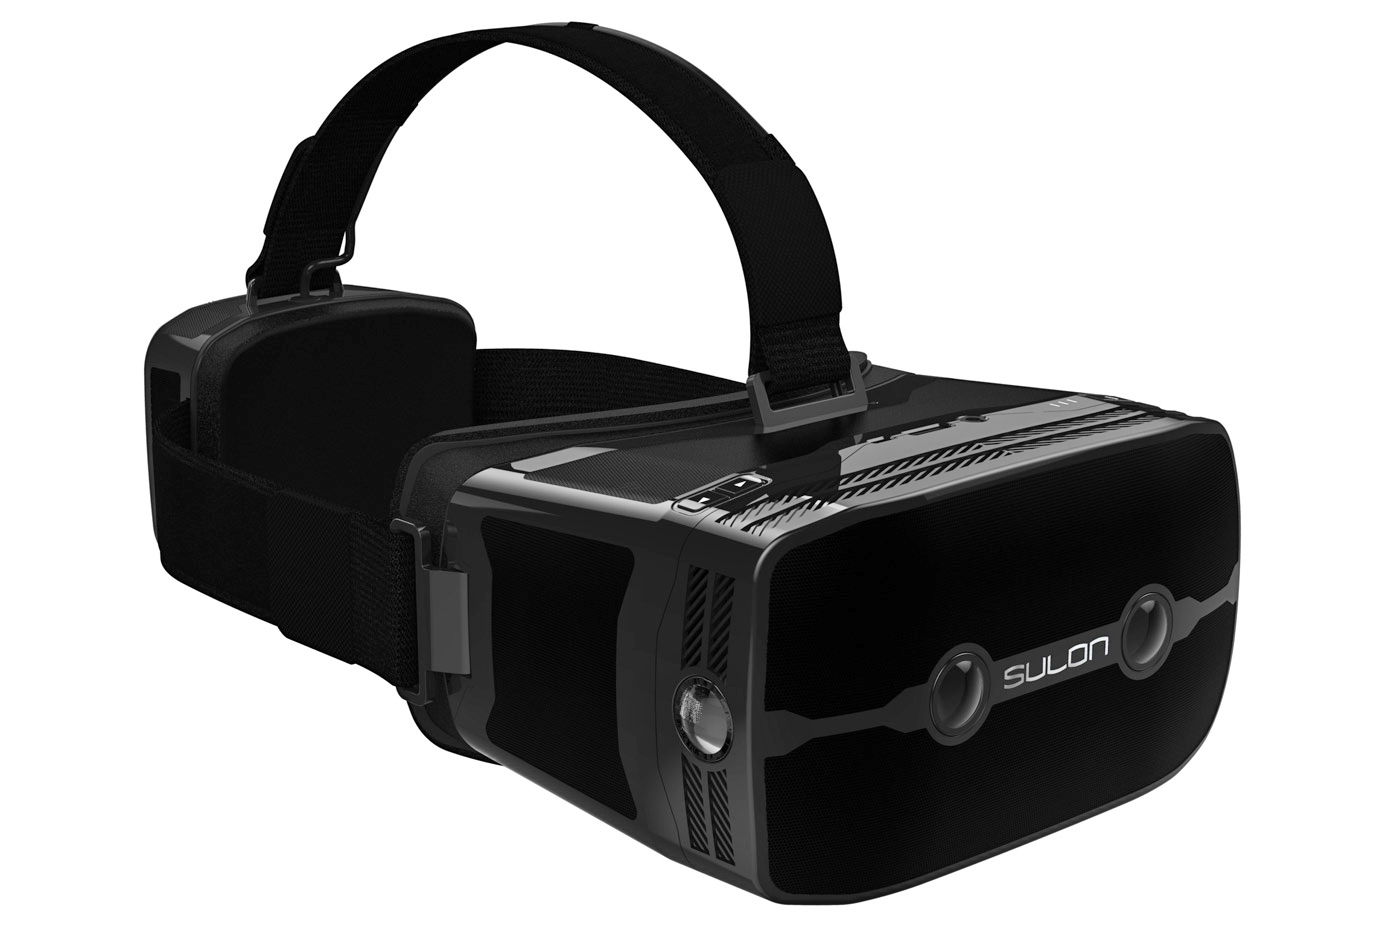 AMD Powers Sulon Q VR/AR Headset